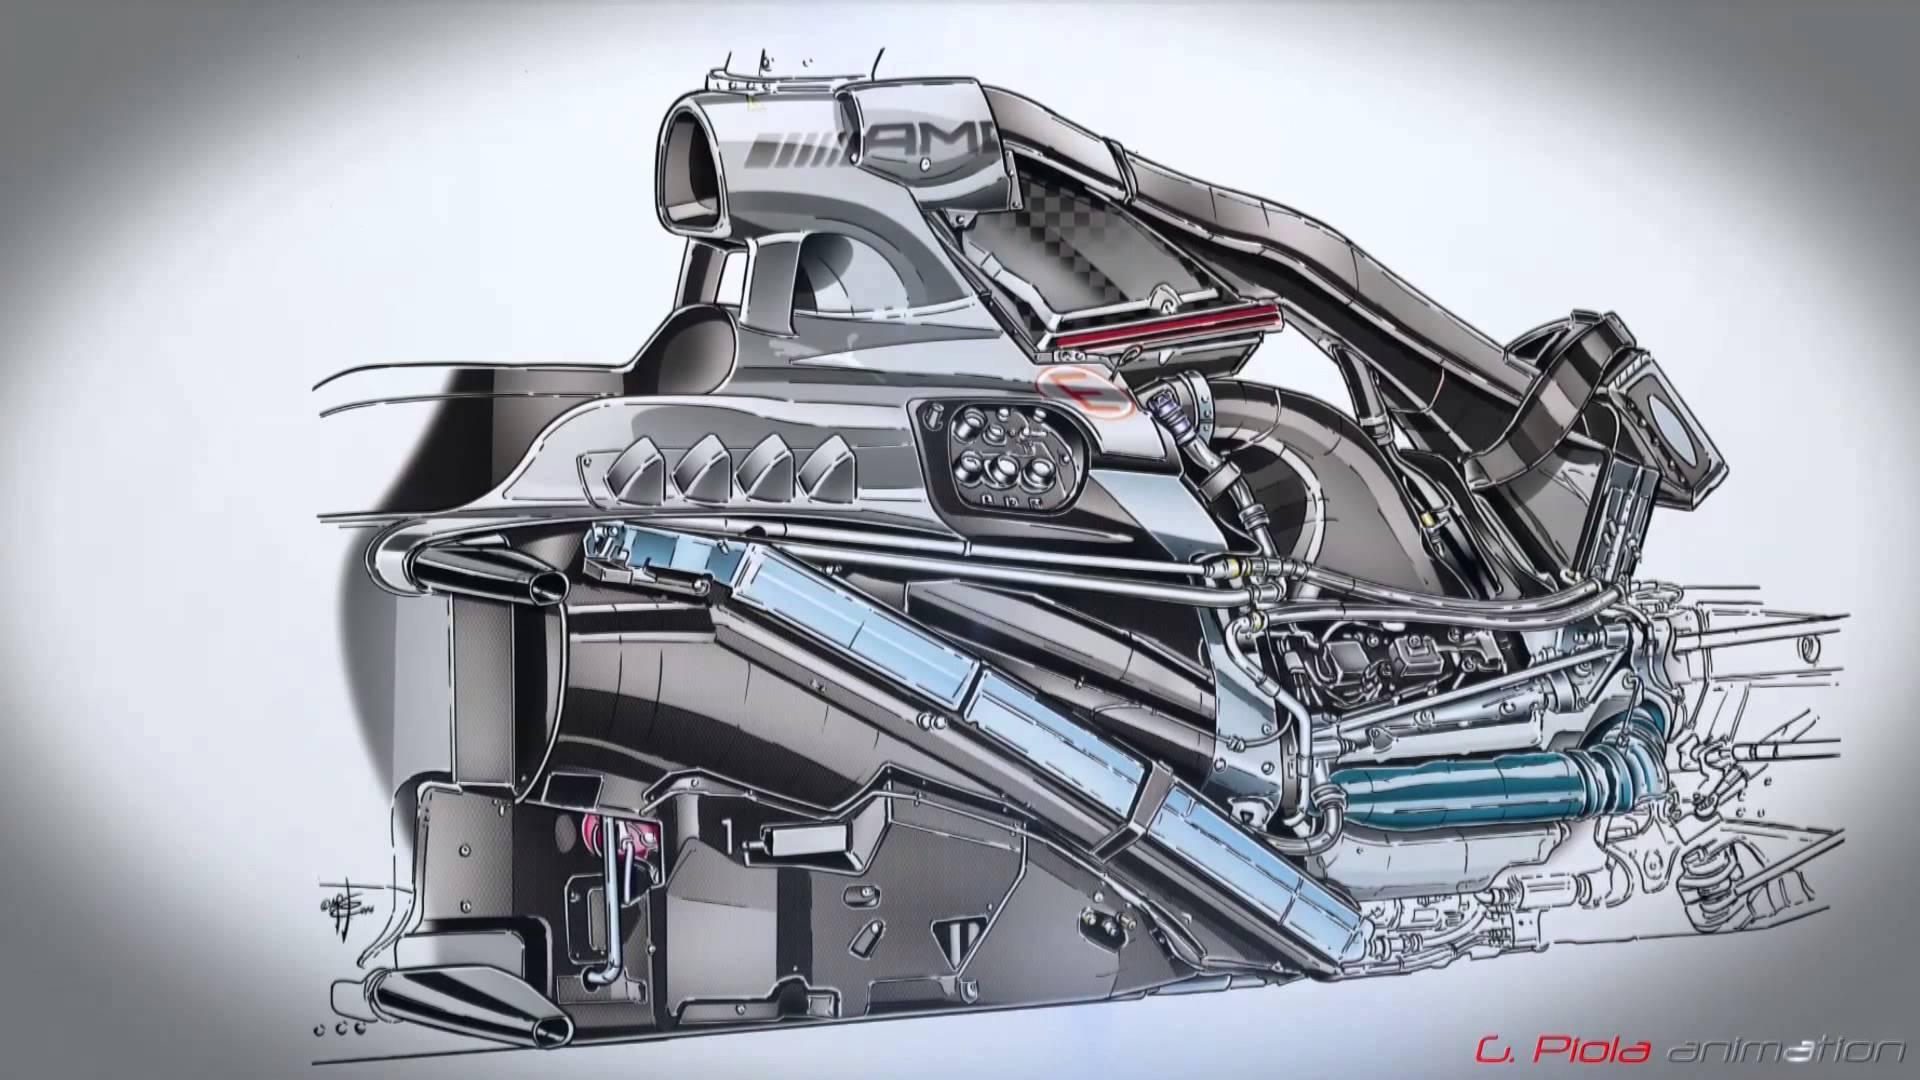 f1 engine wallpaper - photo #18